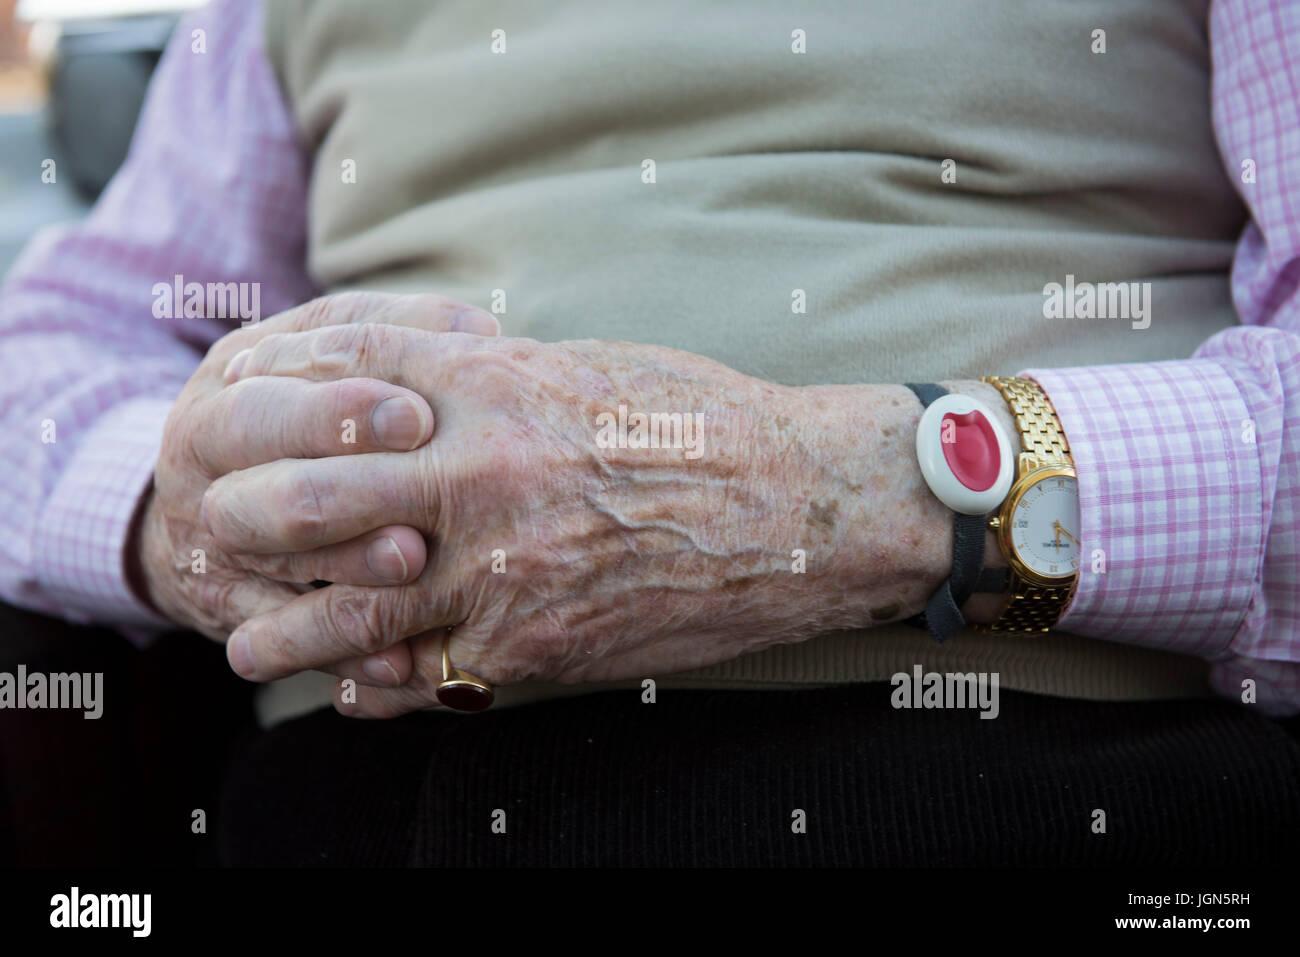 Ein gefährdete Rentner trägt ein Panik-Alarm-Armband. Stockbild